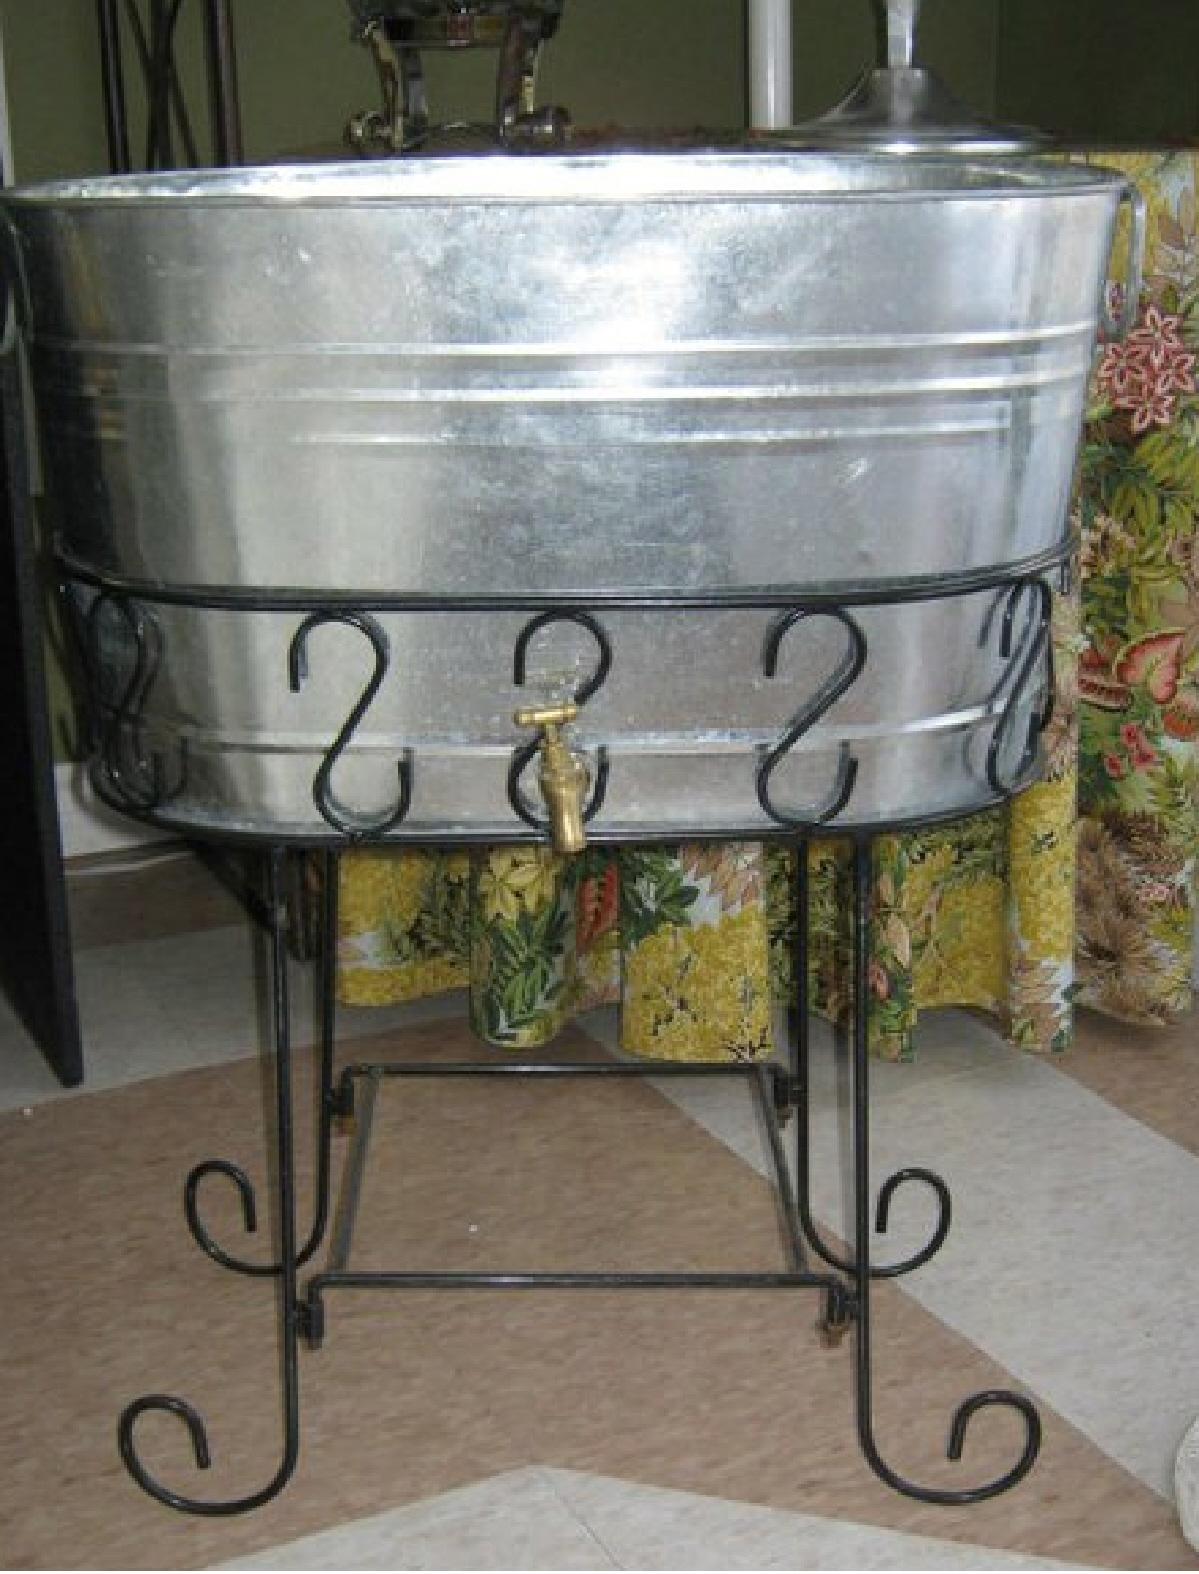 Beverage tub silver